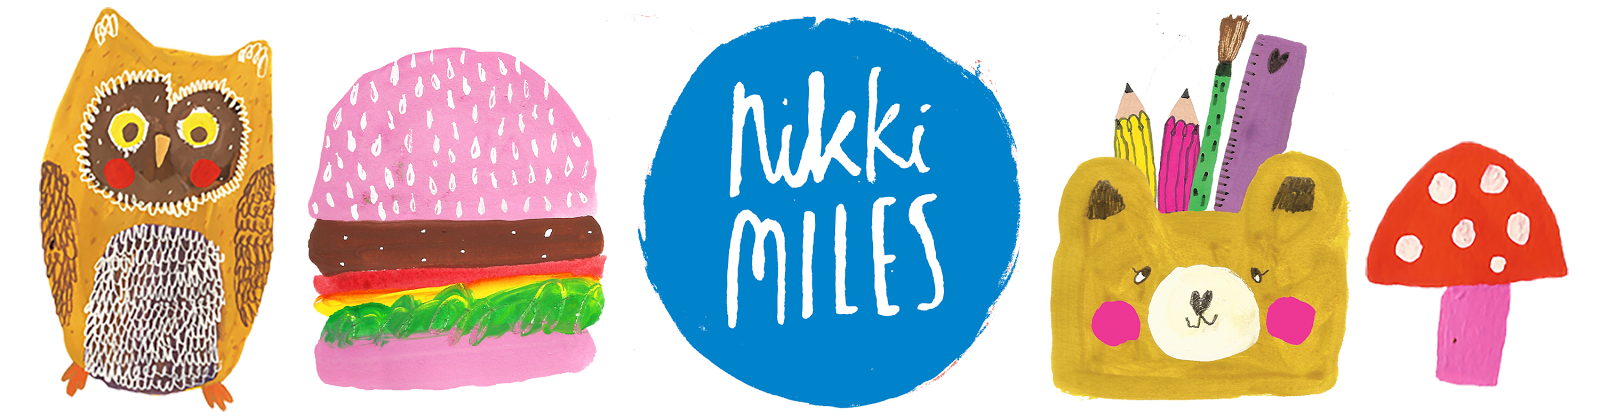 NIKKI MILES